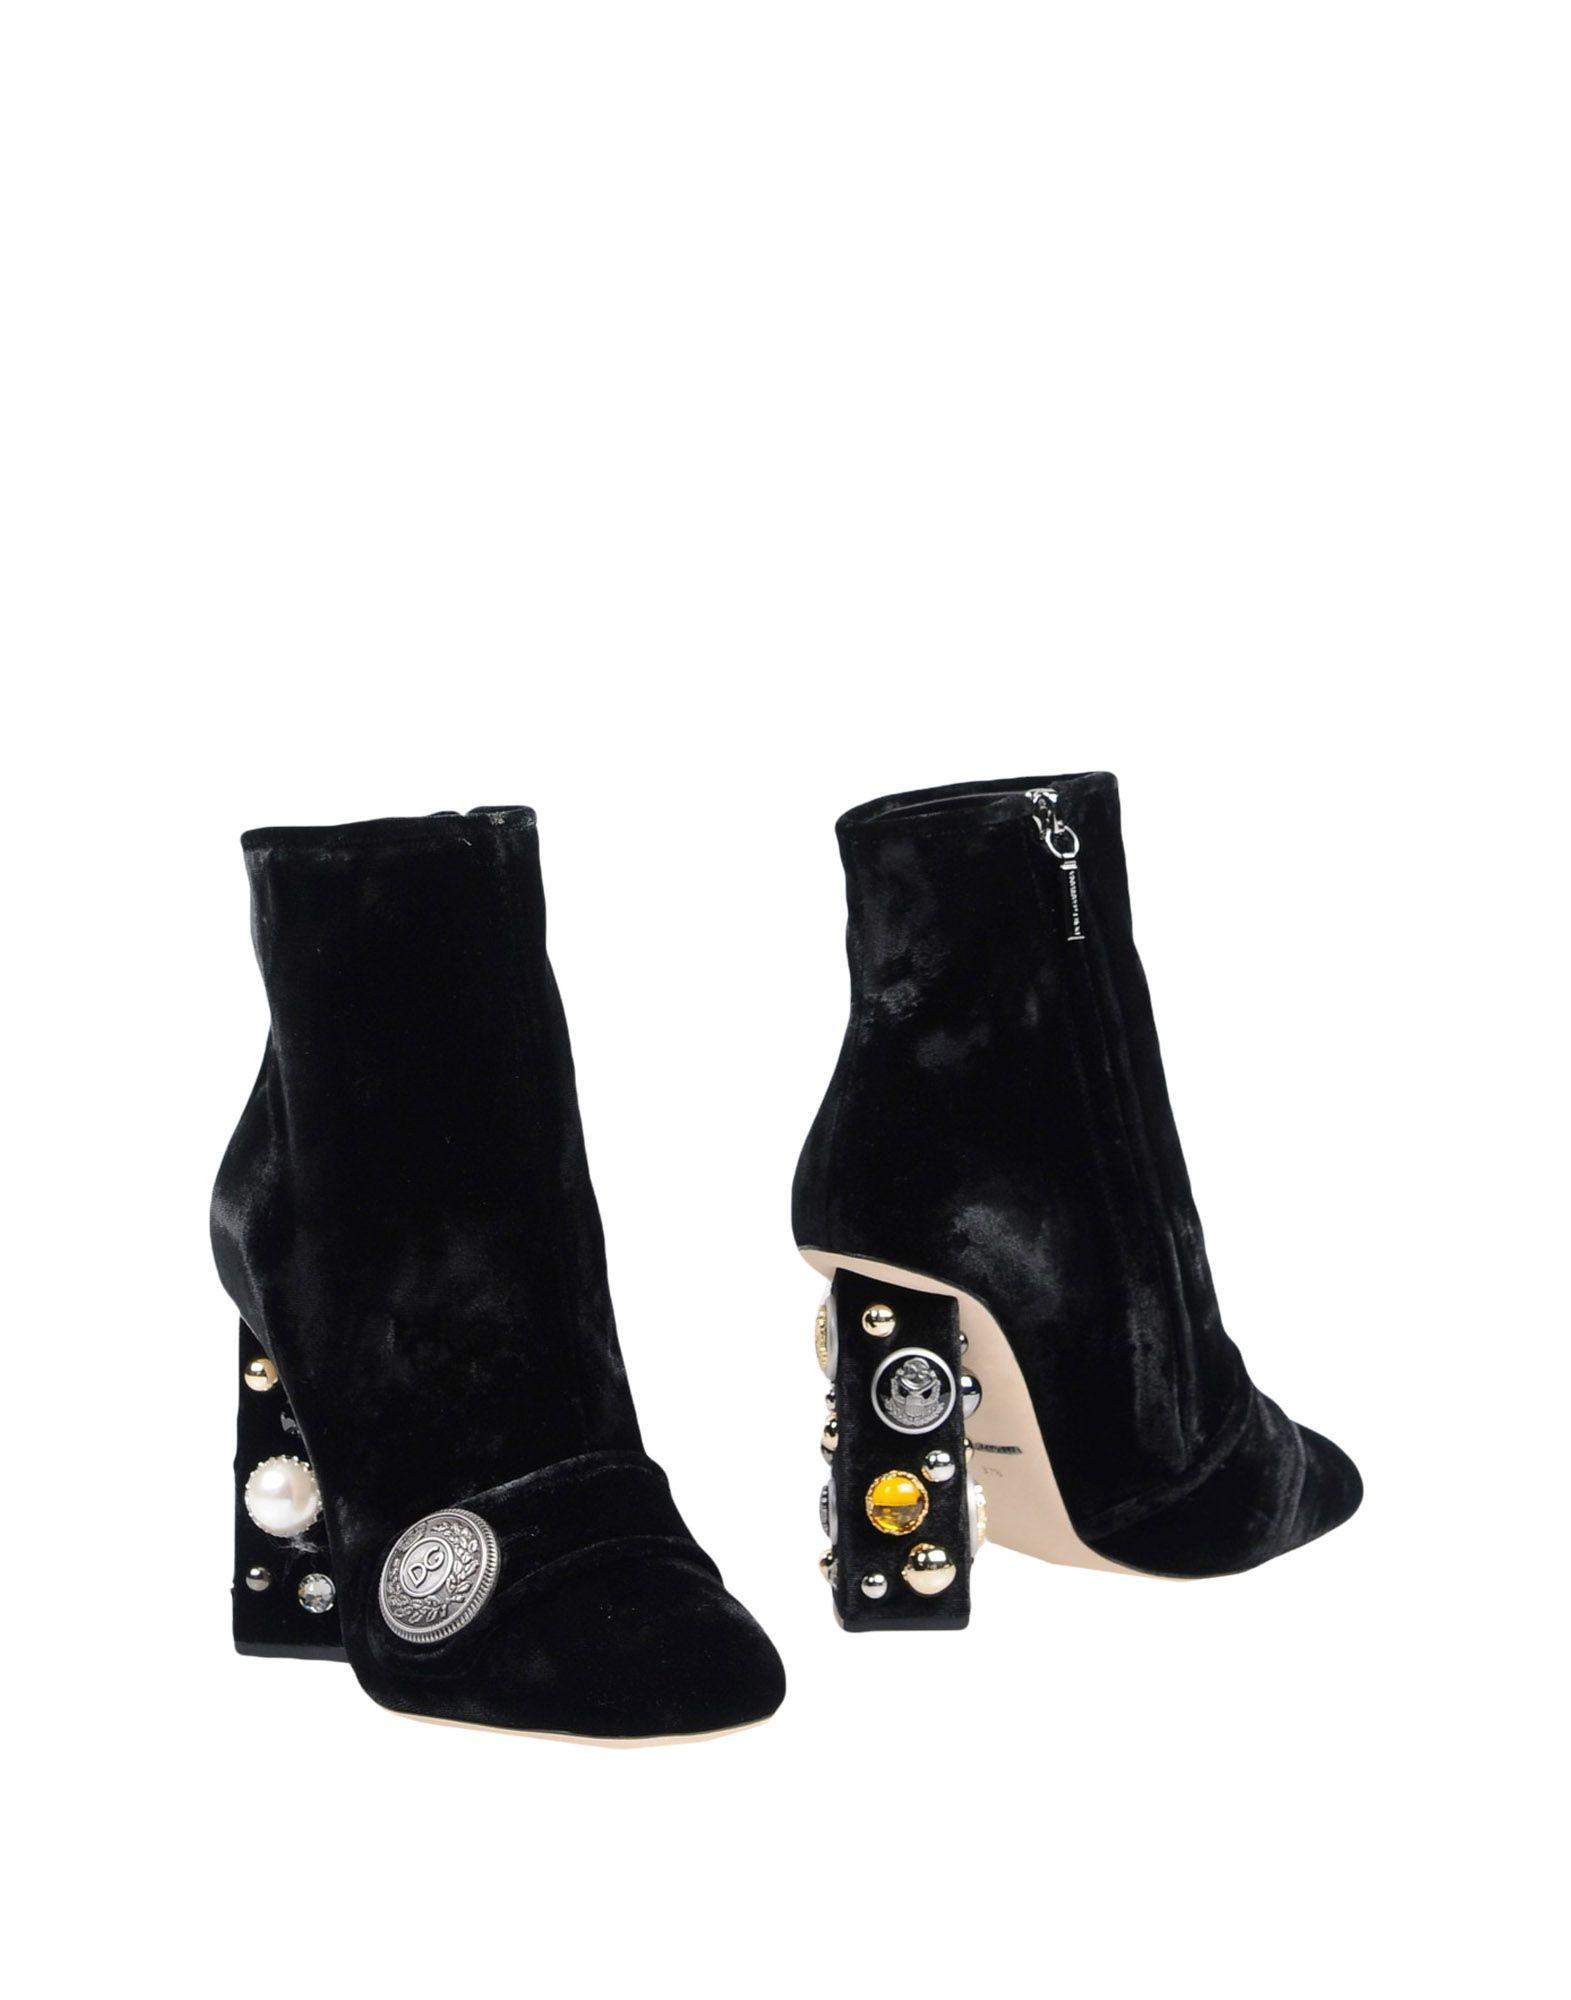 Bottine Dolce & Gabbana Femme - Bottines Dolce & Gabbana sur